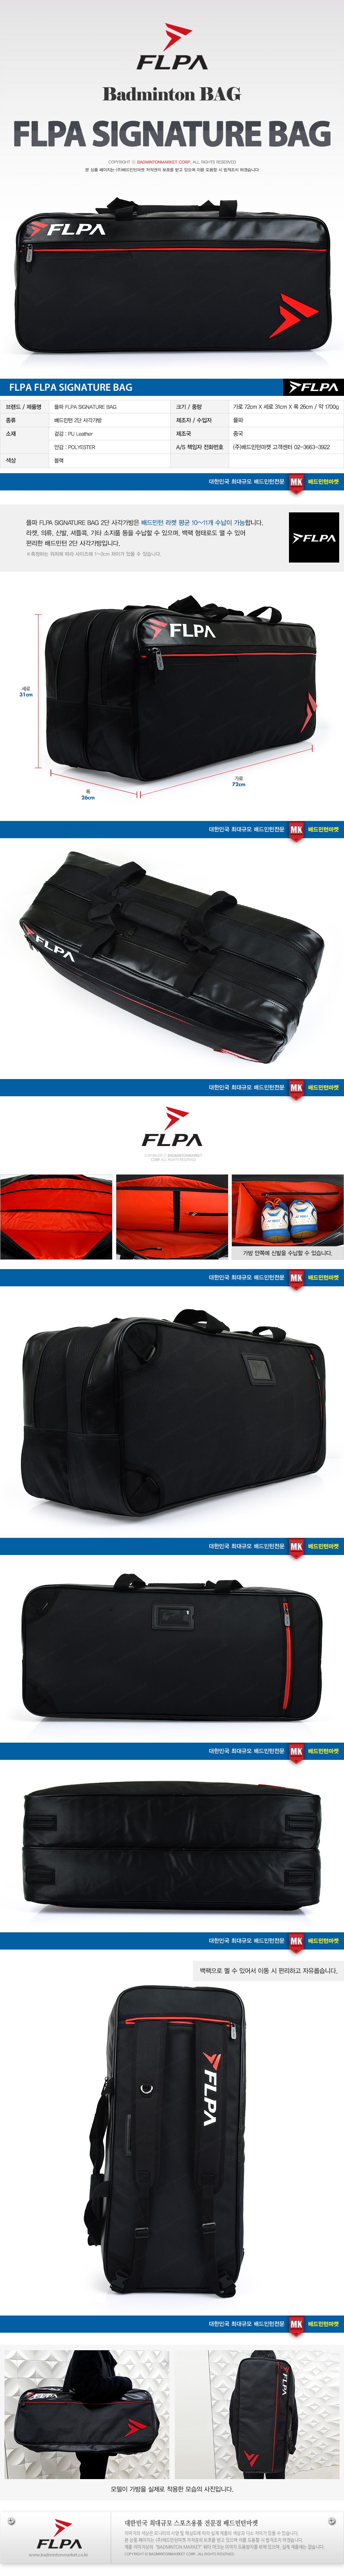 FLPA SIGNATURE BAG